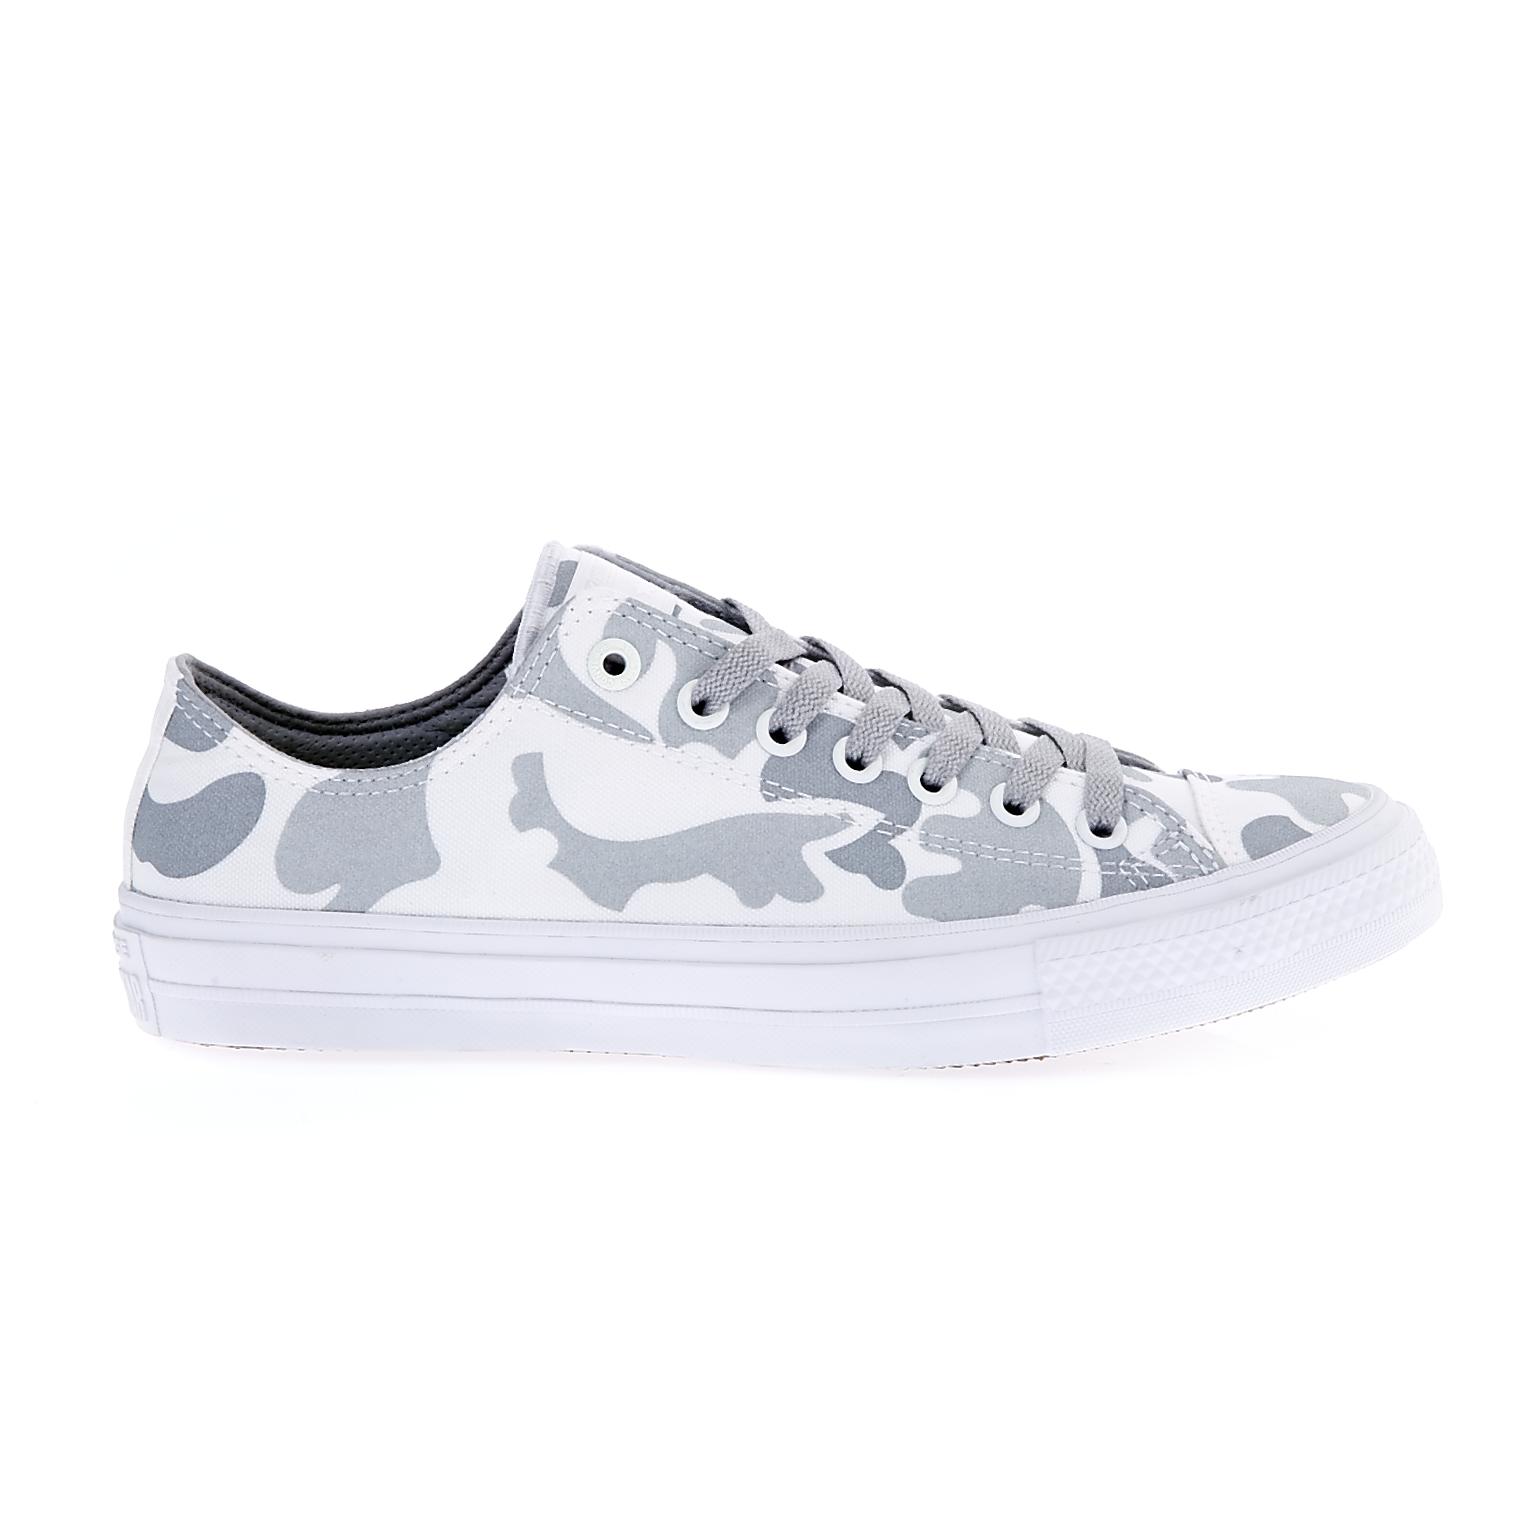 CONVERSE – Unisex παπούτσια Chuck Taylor All Star II Ox λευκά-γκρι